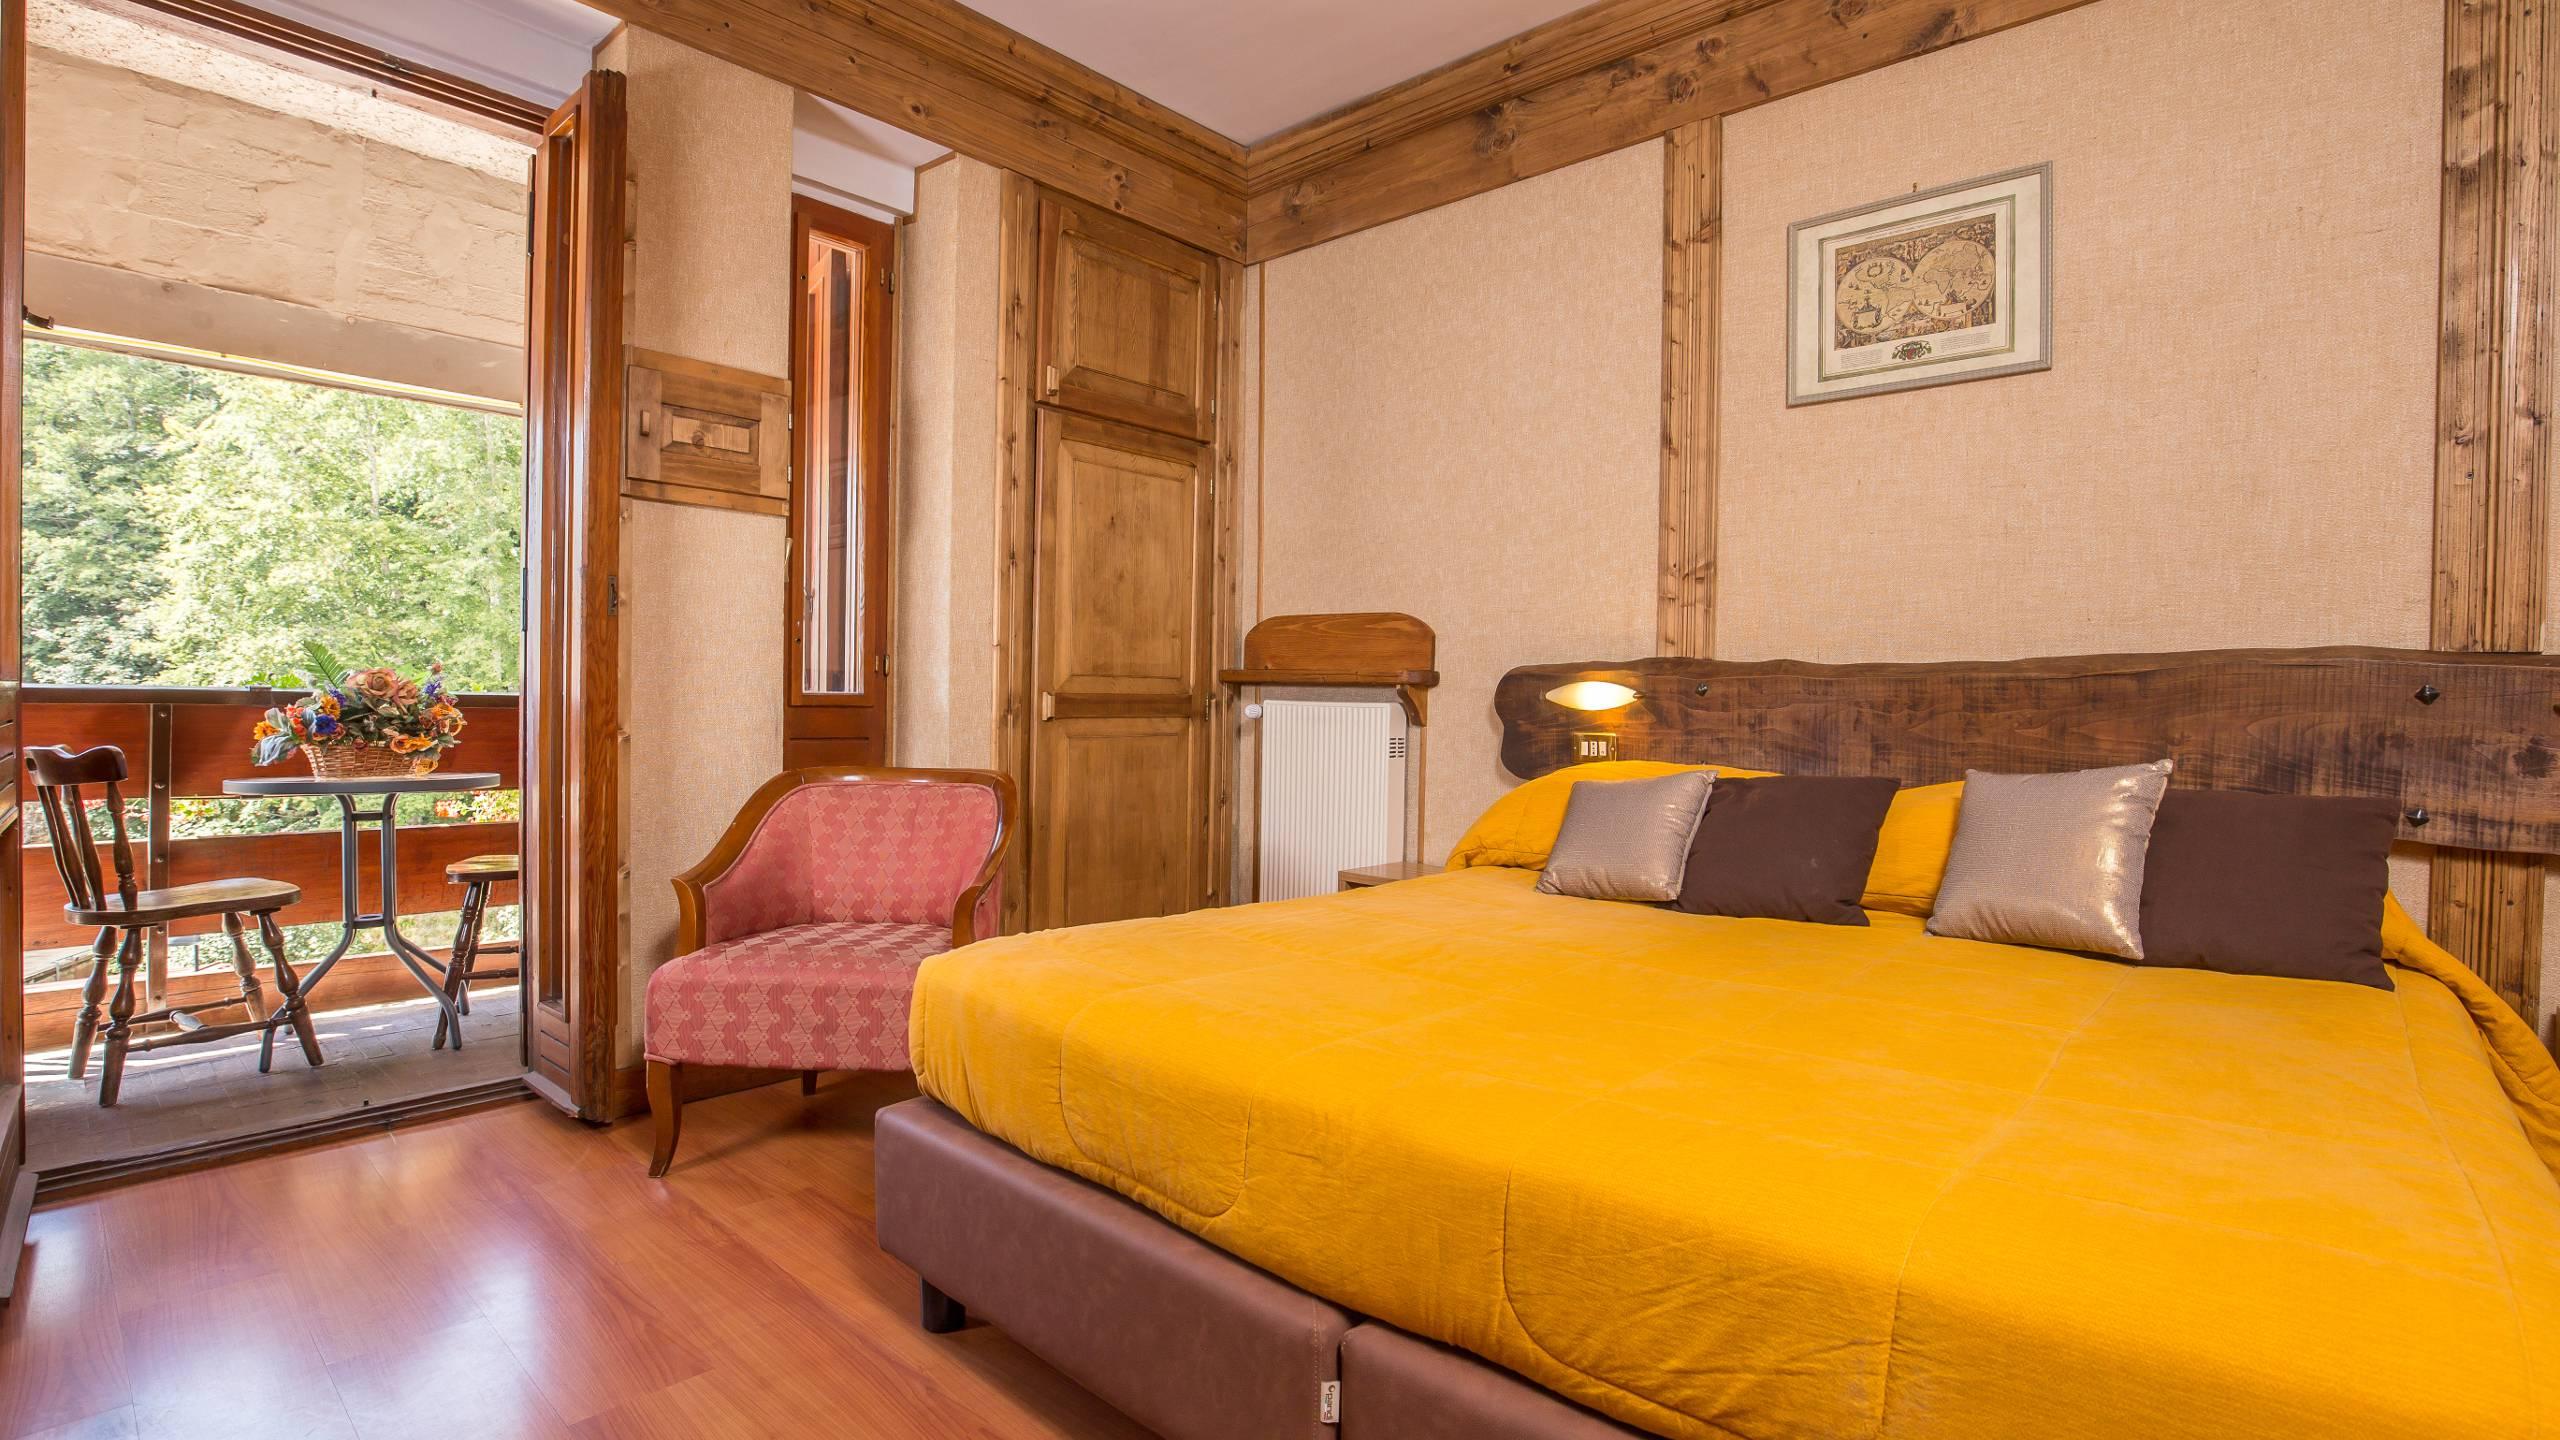 Hotel-Togo-Palace-Terminillo-Rieti-camera-055